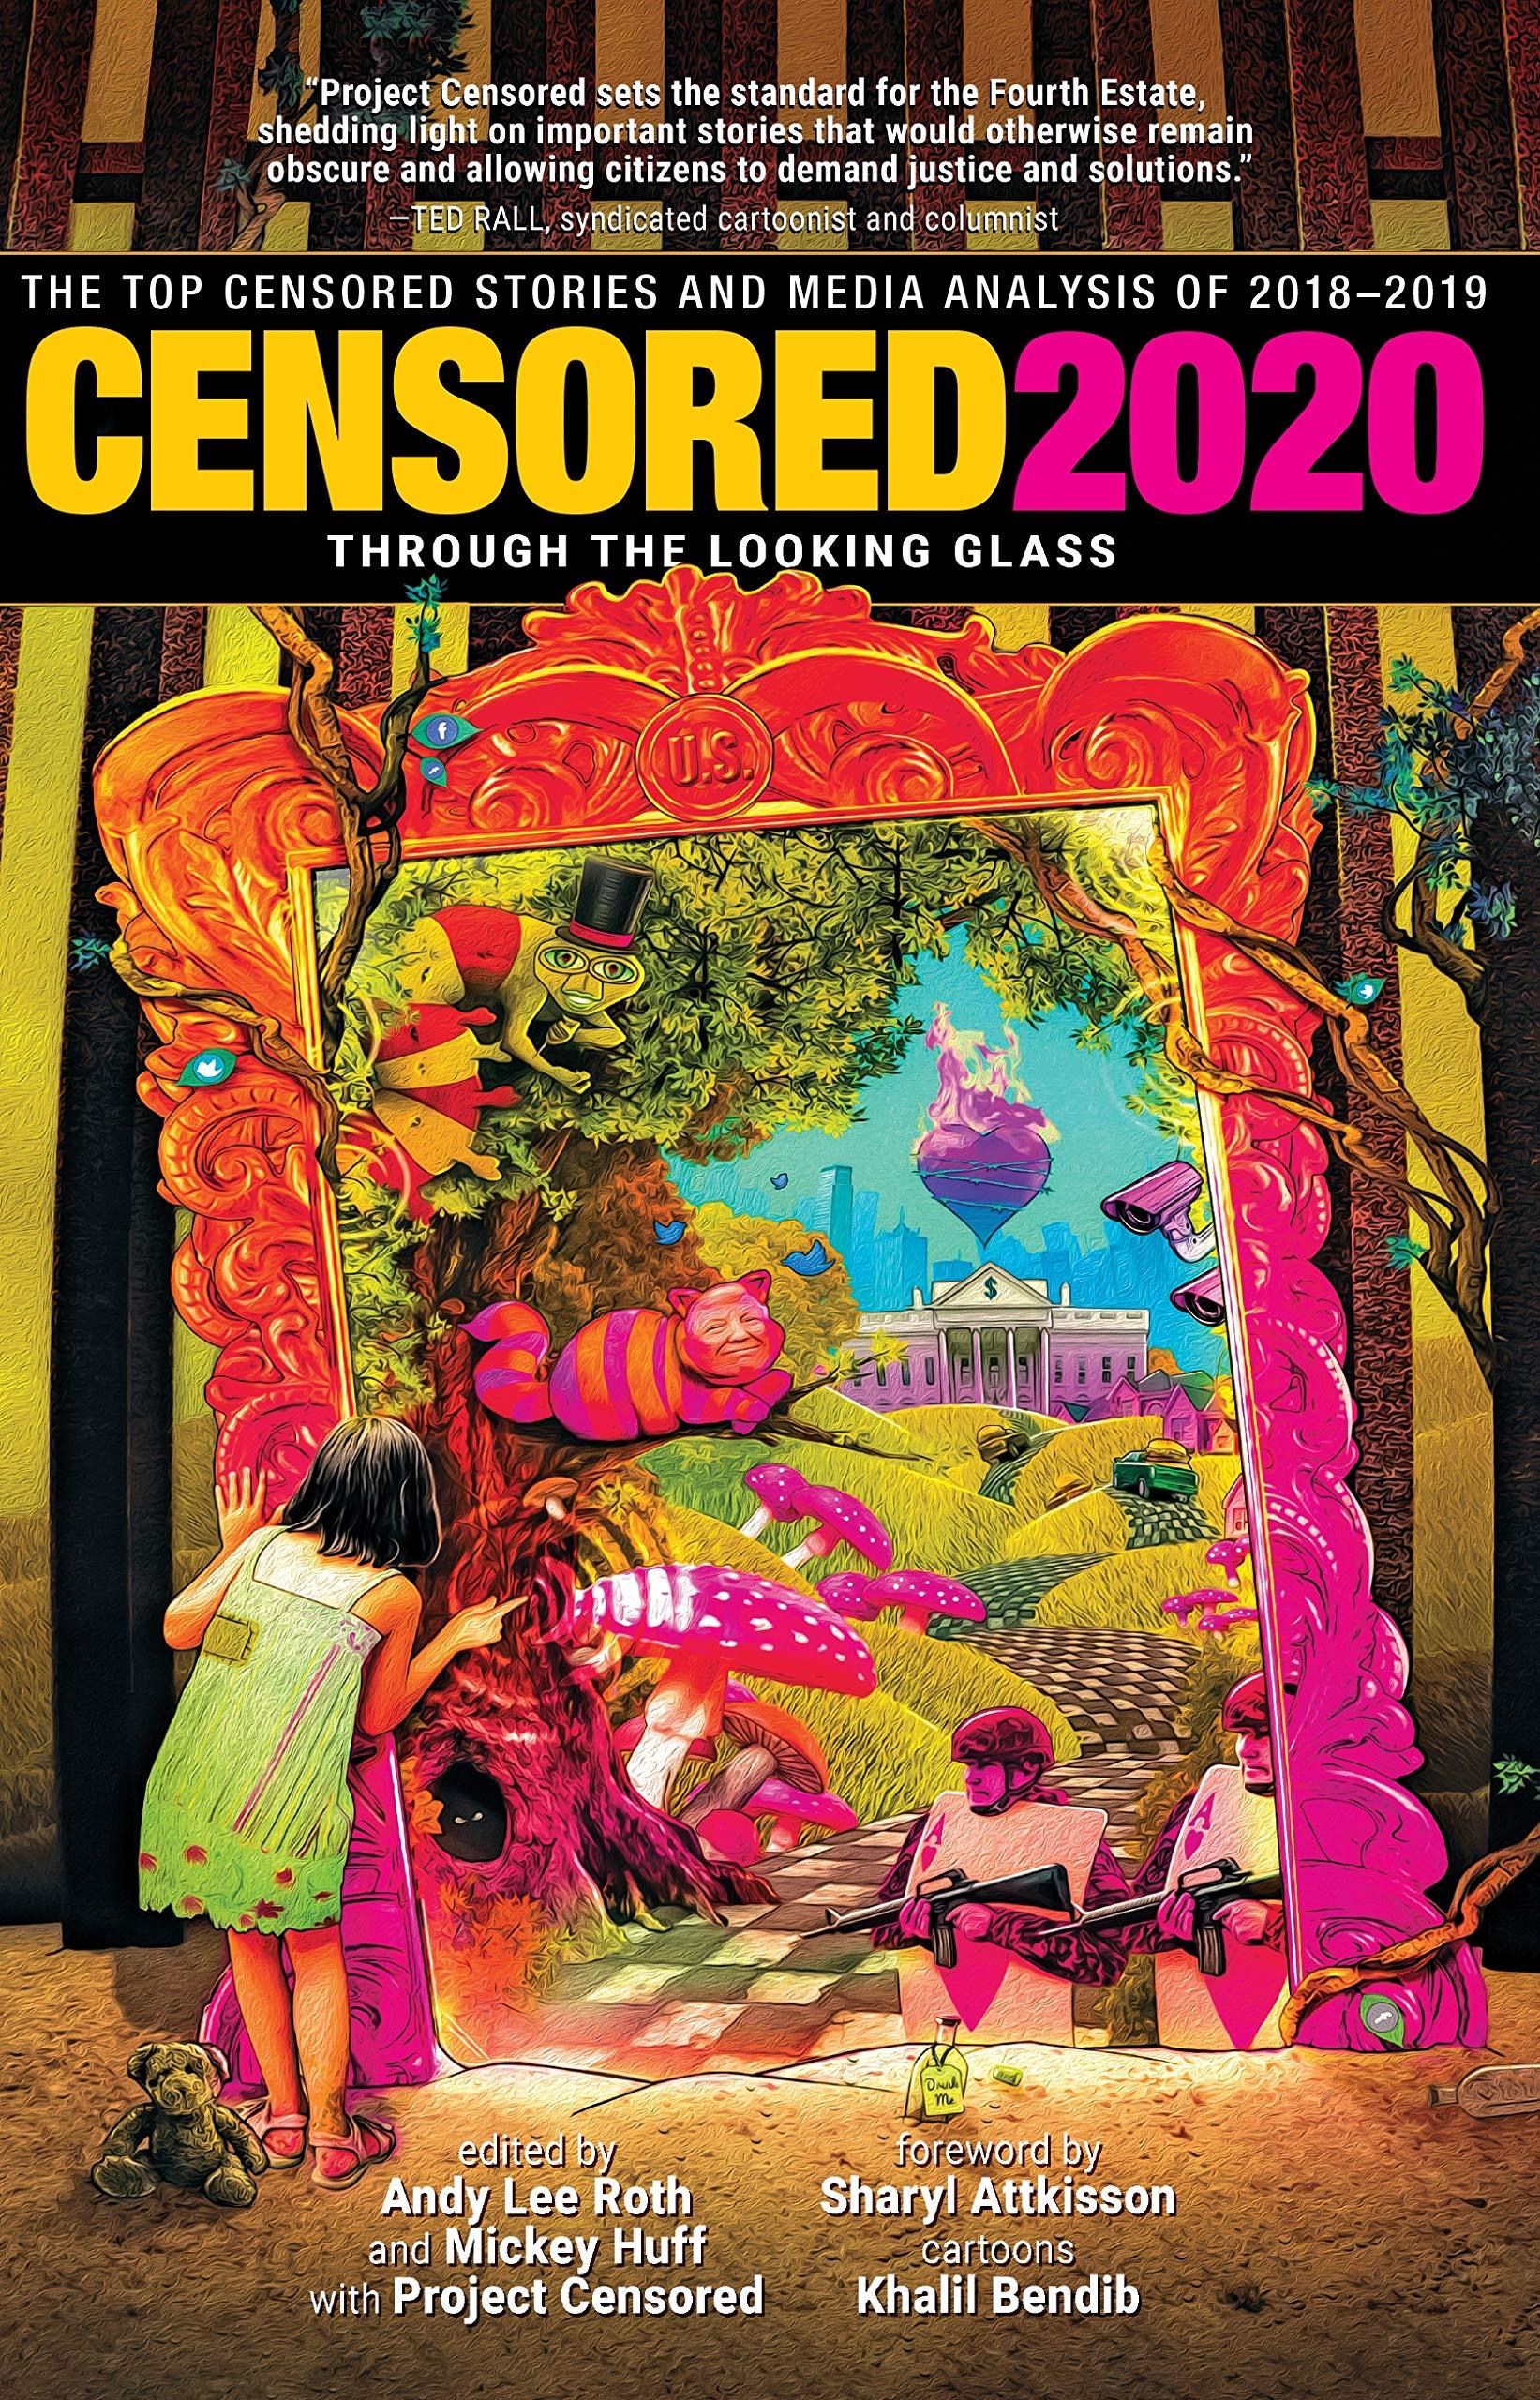 Amazon.com: Censored 2020 (9781609809607): Andy Lee Roth ...